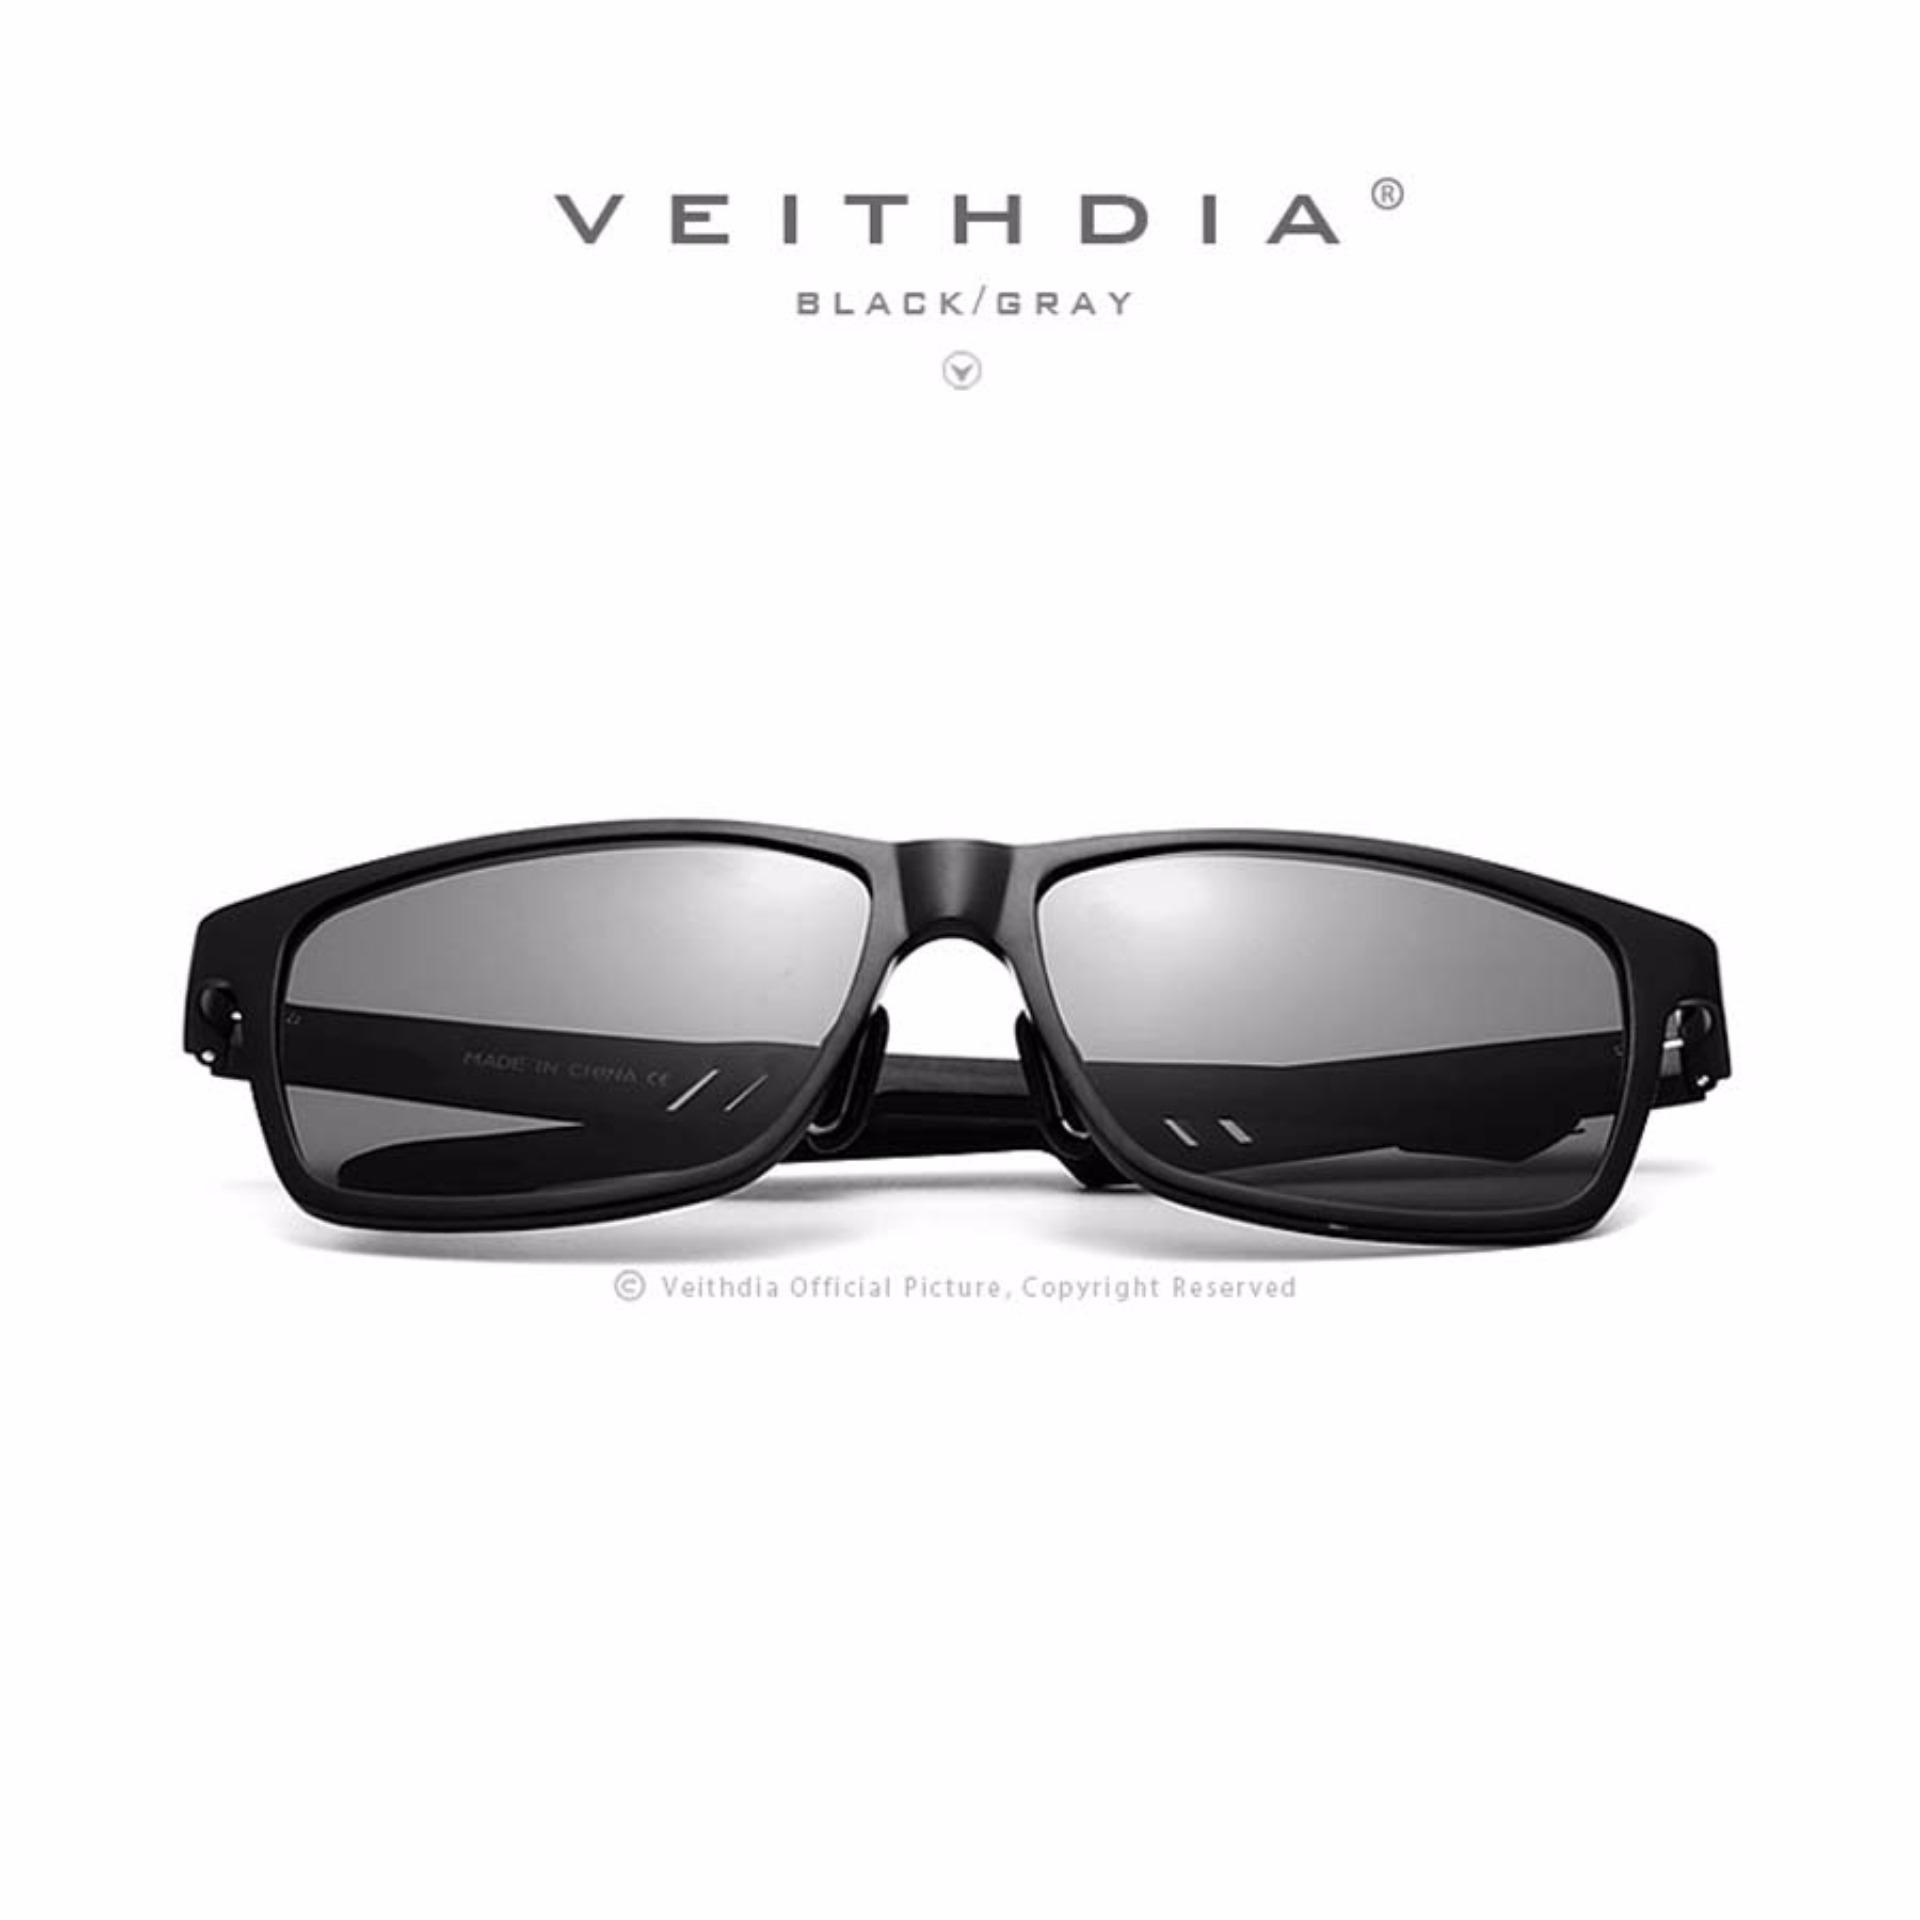 Toko Veithdia V 6560 Kacamata Anti Radiasi Komputer Frame Ringan Dan Elegant Bebas Radiasi Gadget Anti Silau Hitam Termurah